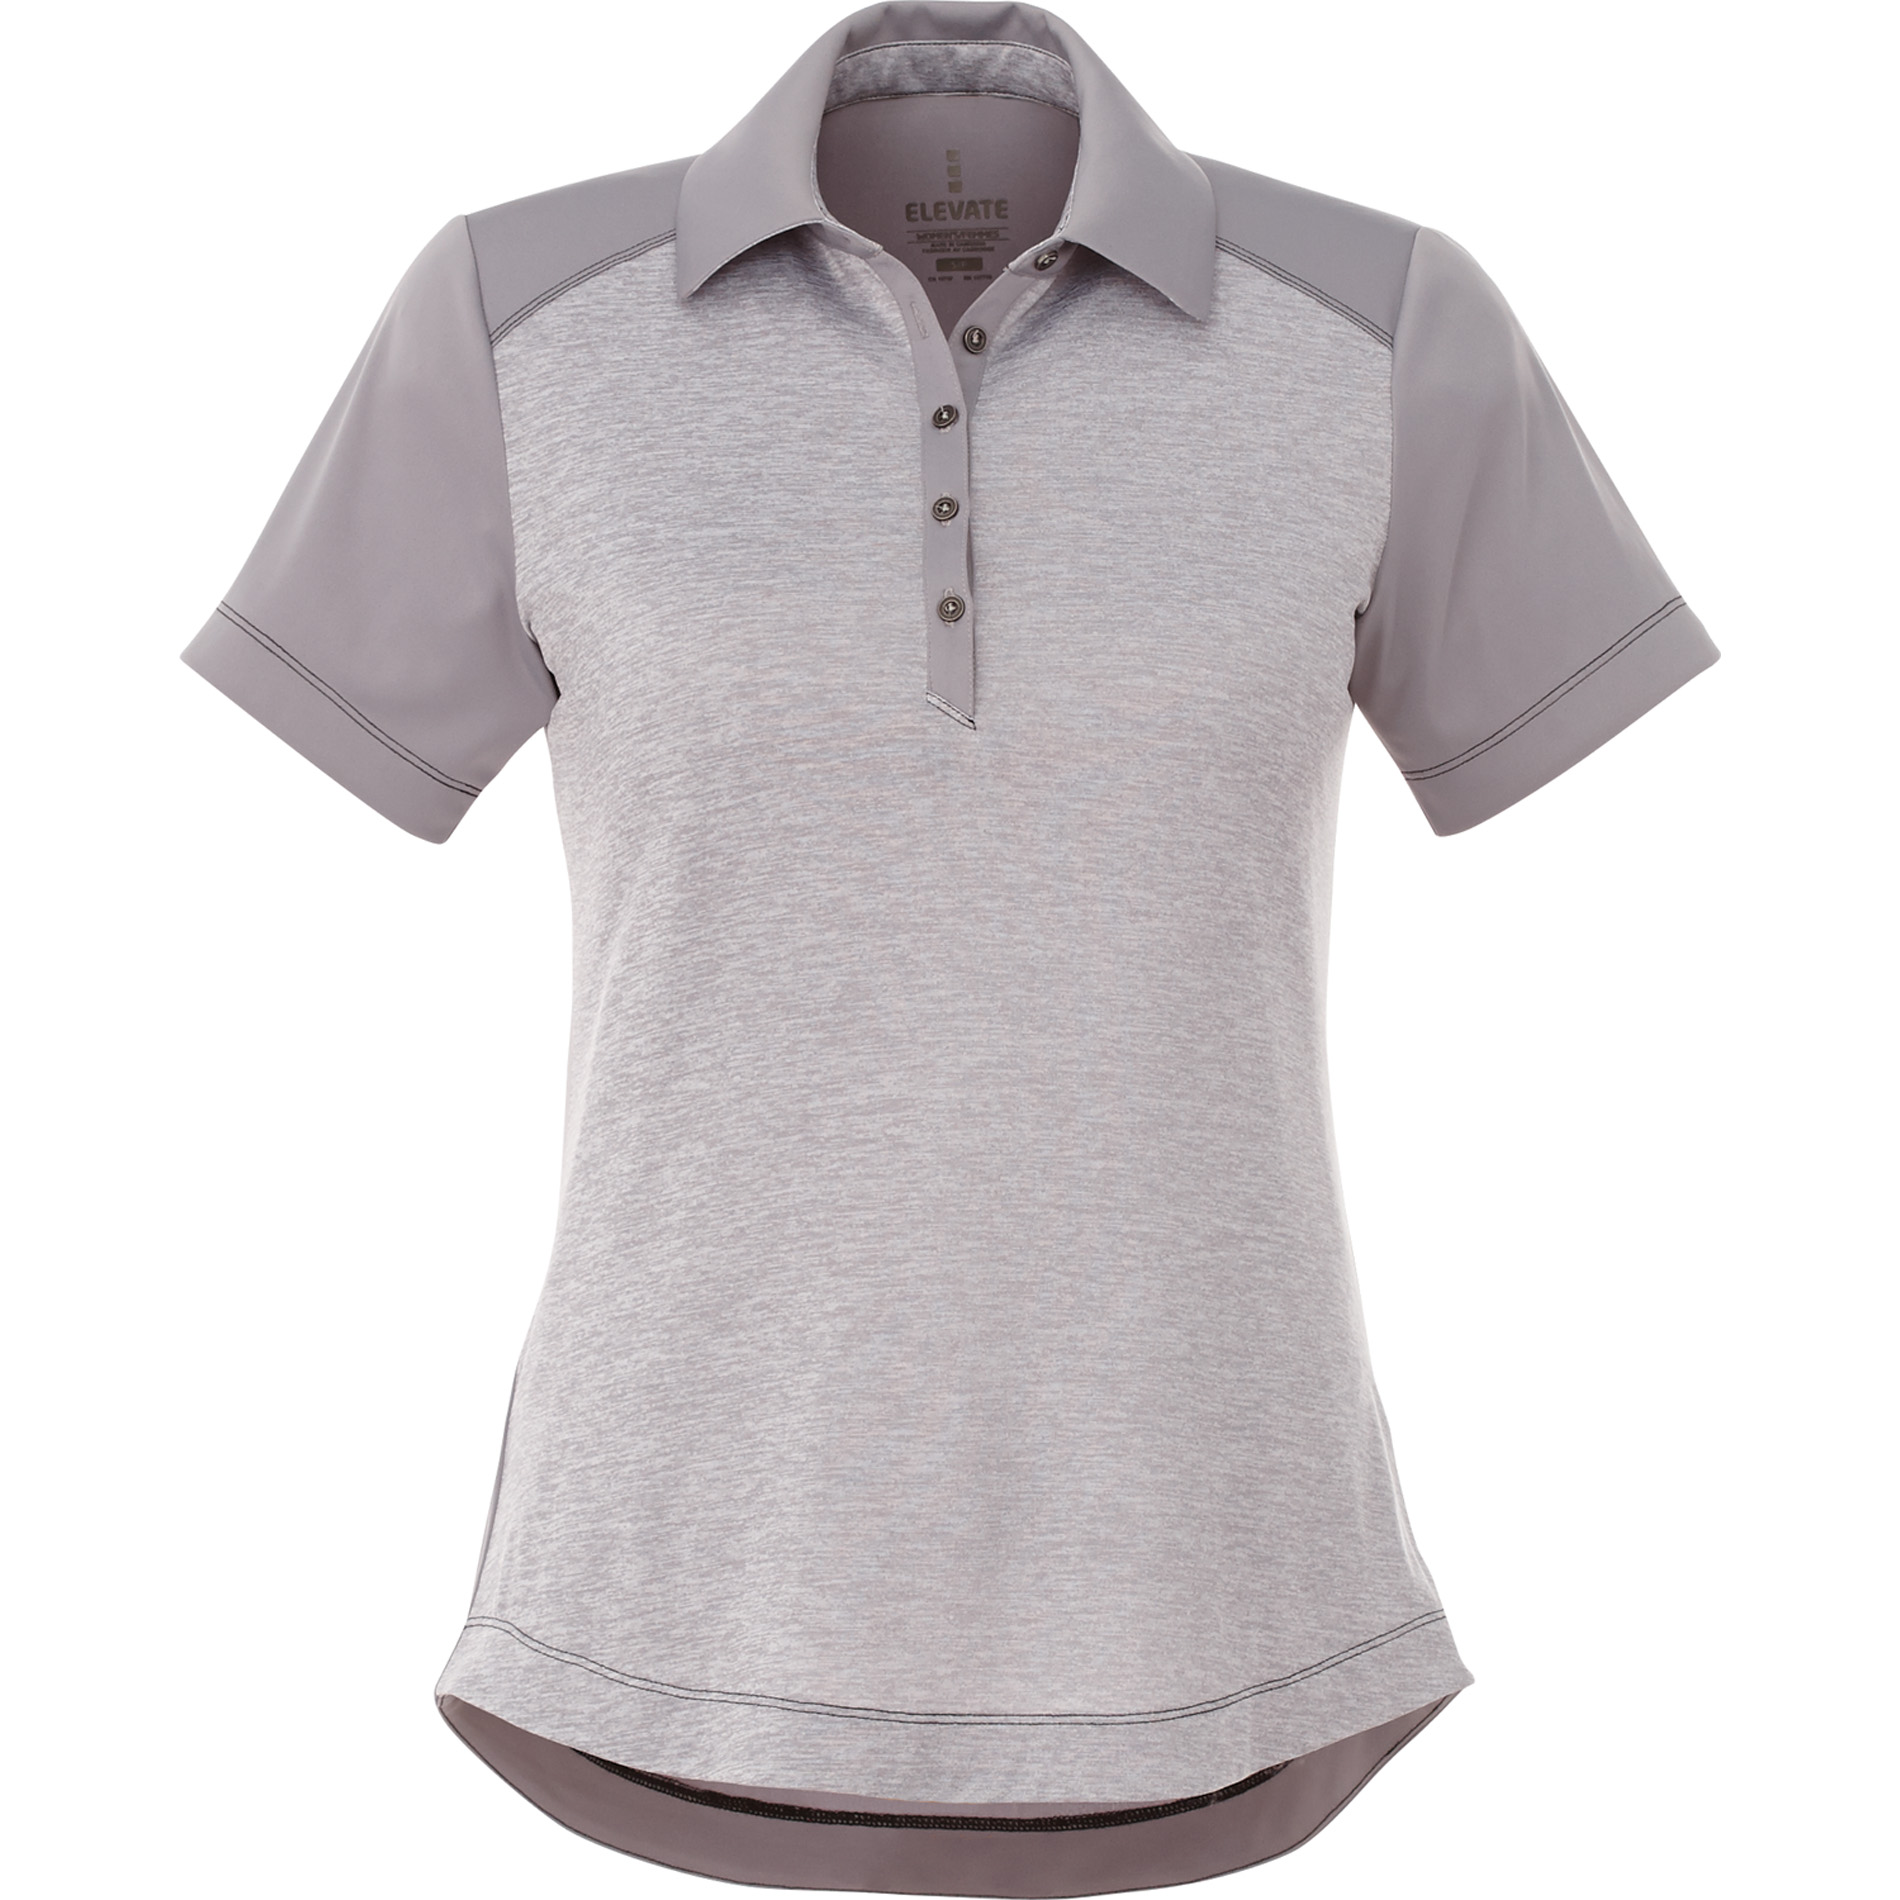 Elevate TM96508 - Women's SANGO Short Sleeve Polo